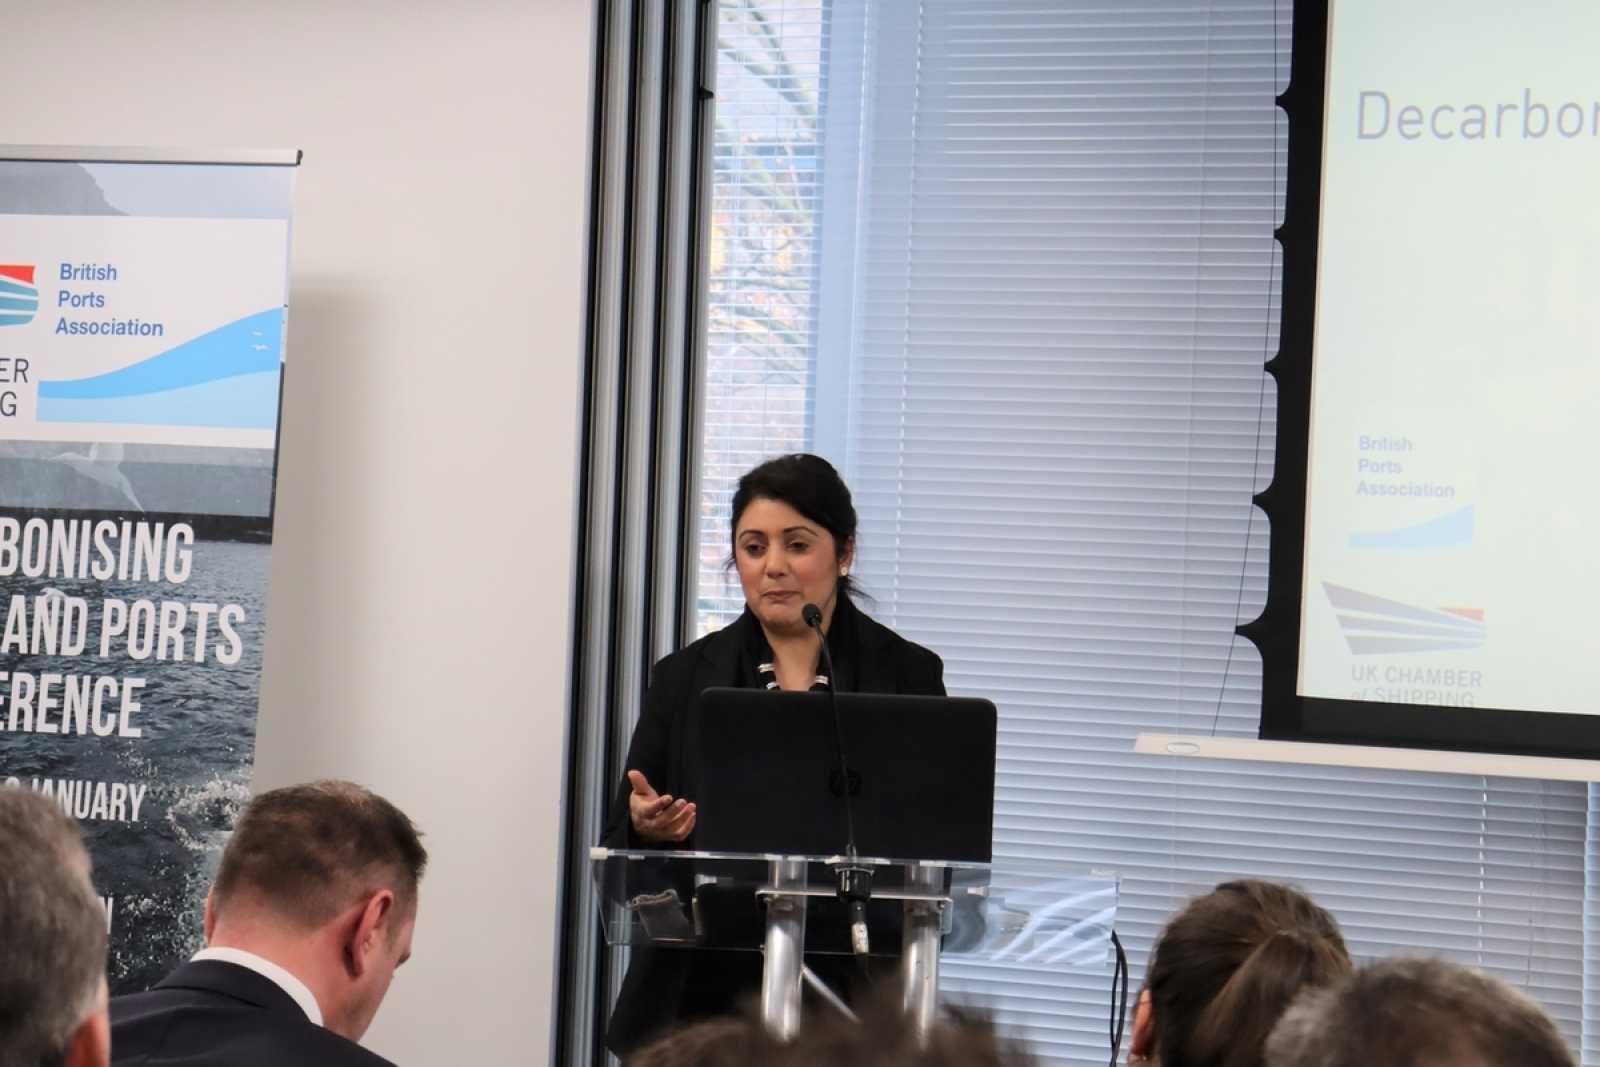 Nusrat Ghani at the UKCS decarbonisation conf